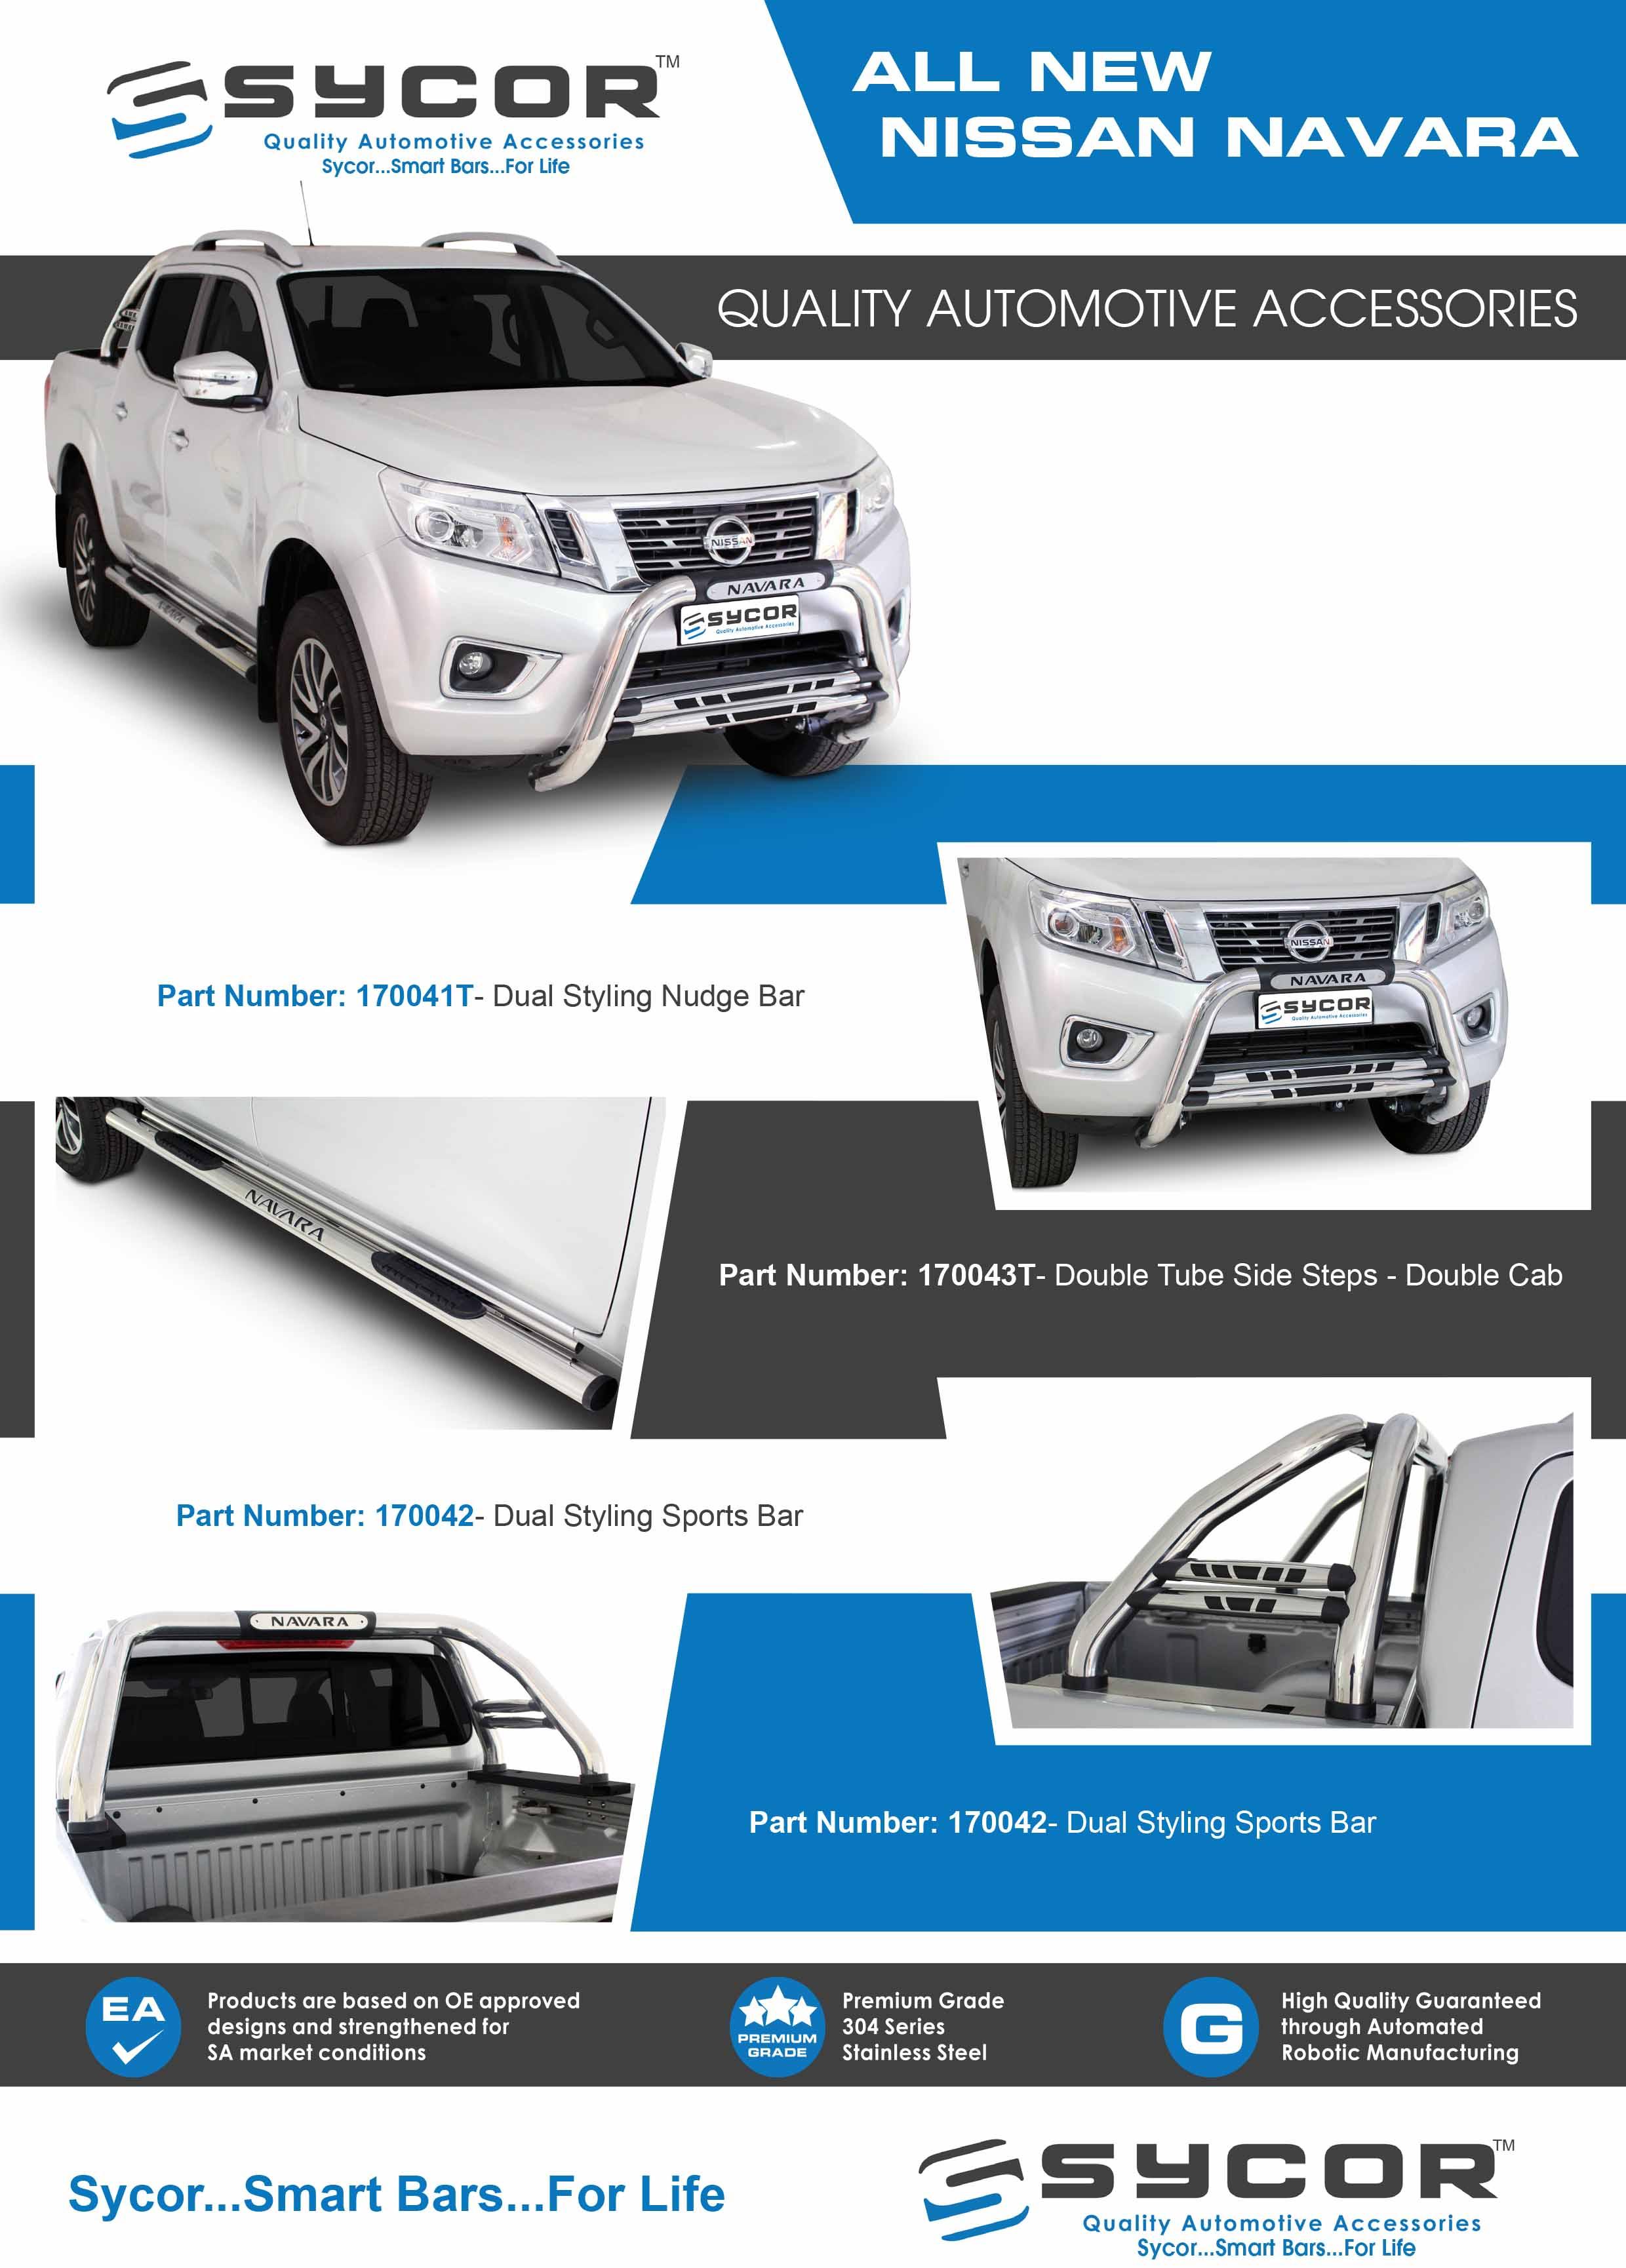 Nissan Navara Nudge Bars and Roll Bars